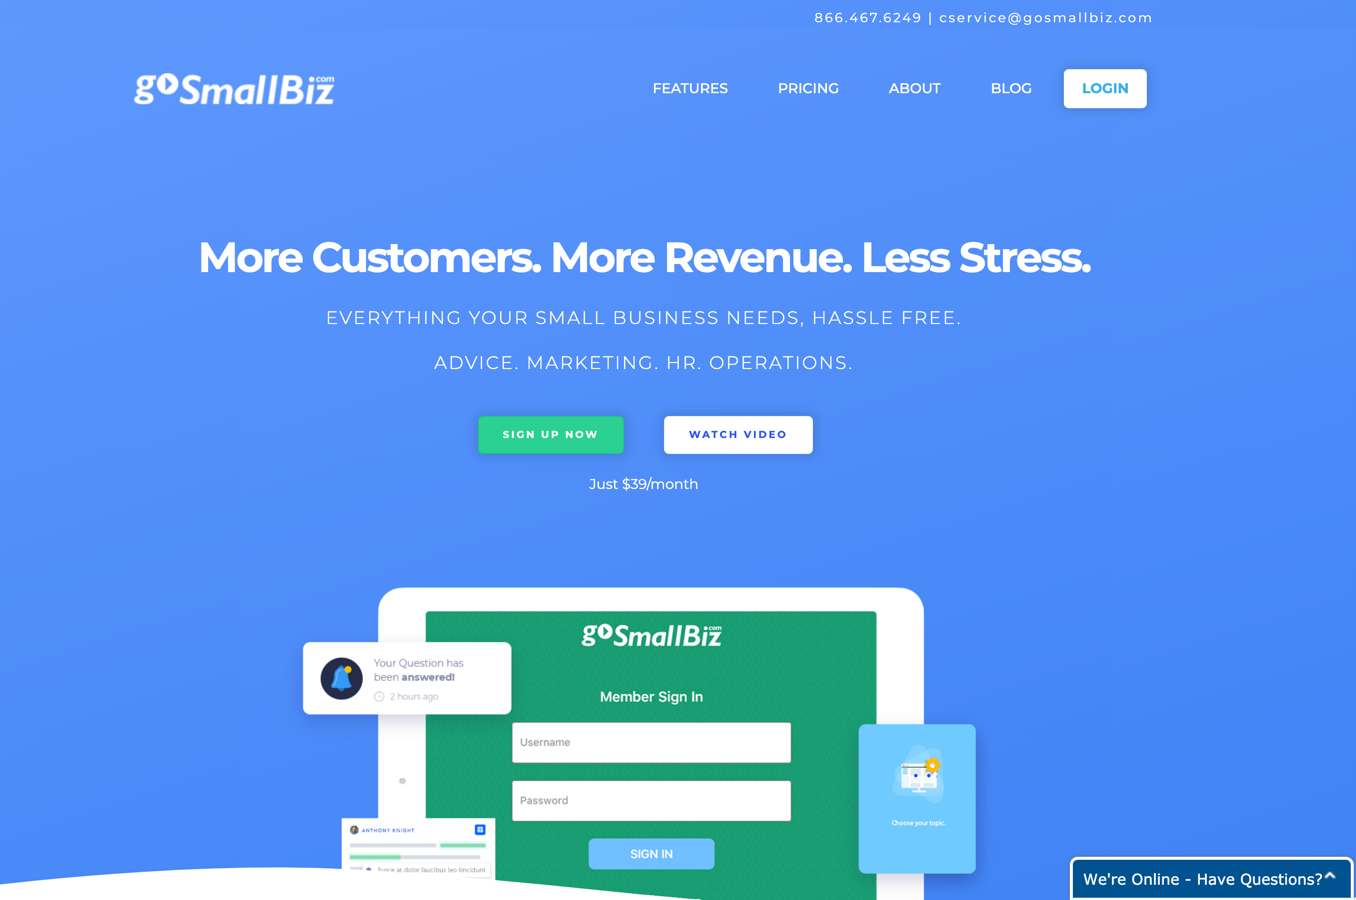 gosmallbiz homepage